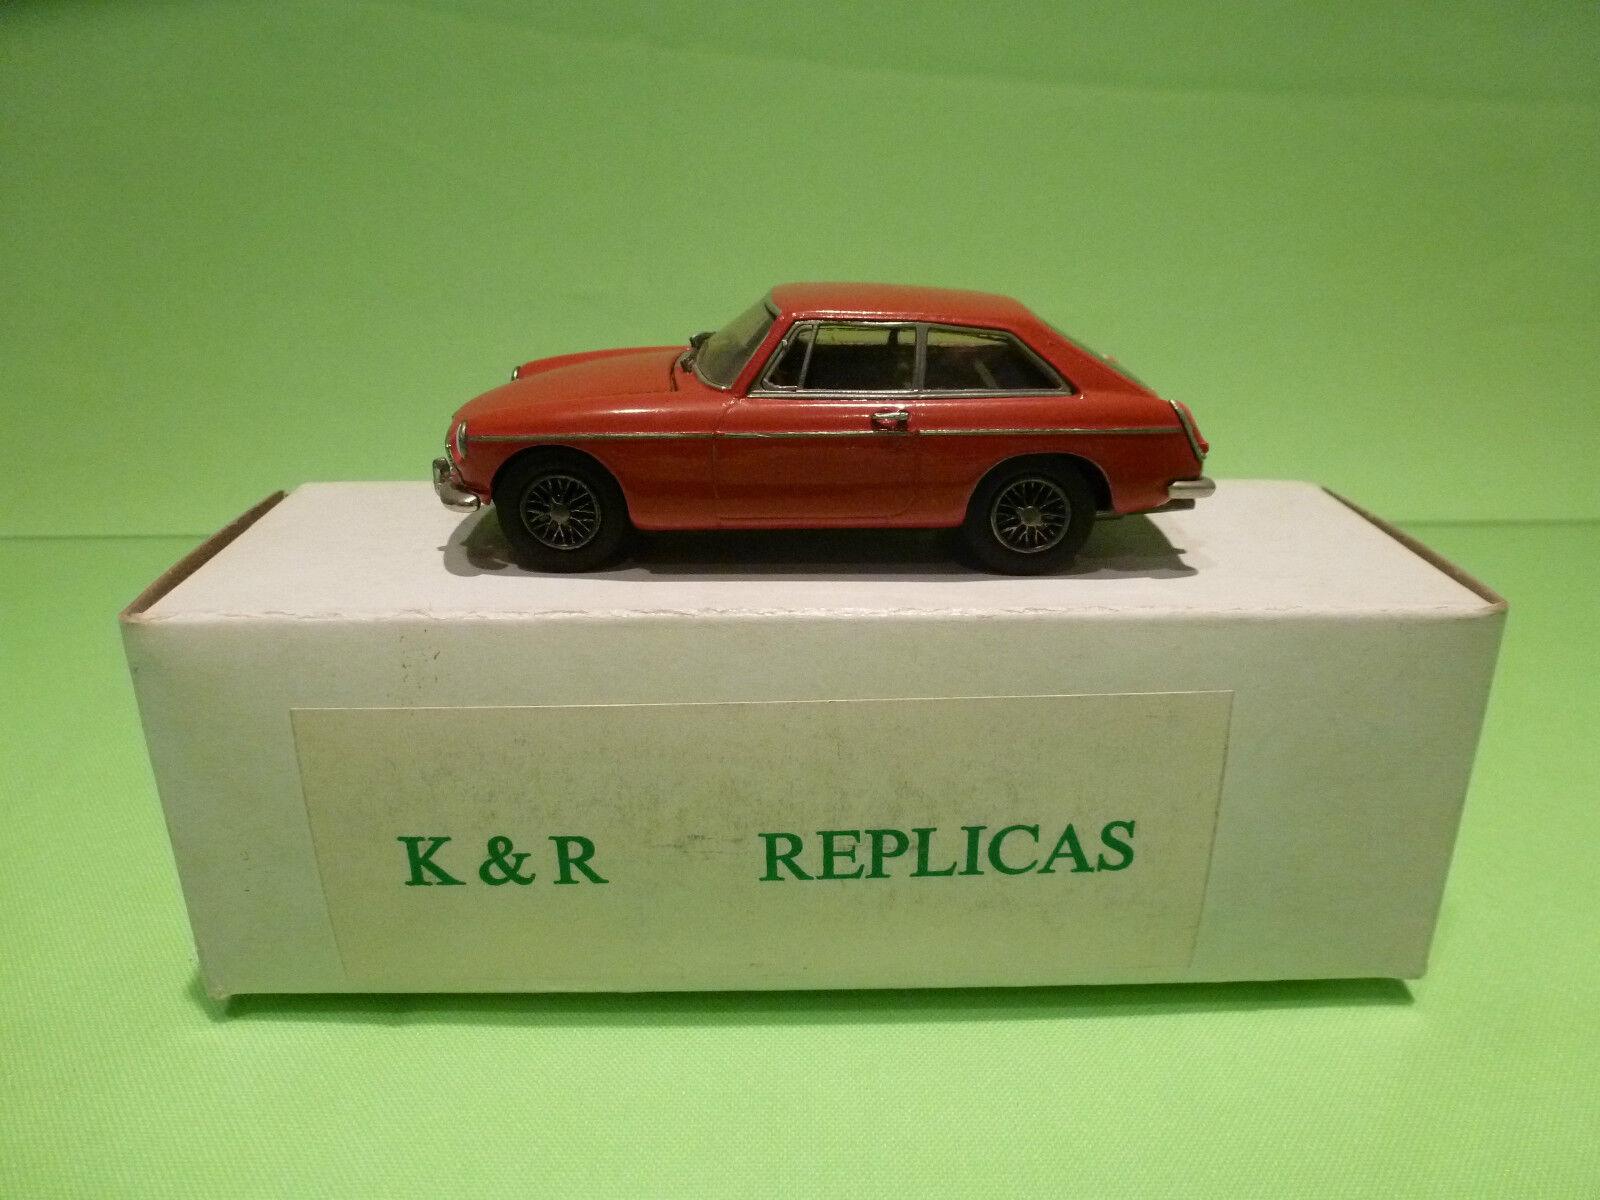 METAL BUILT KIT ACE 12 K&R REPLICAS MG B GT MKII 1 43 - RARE SELTEN - IN BOX